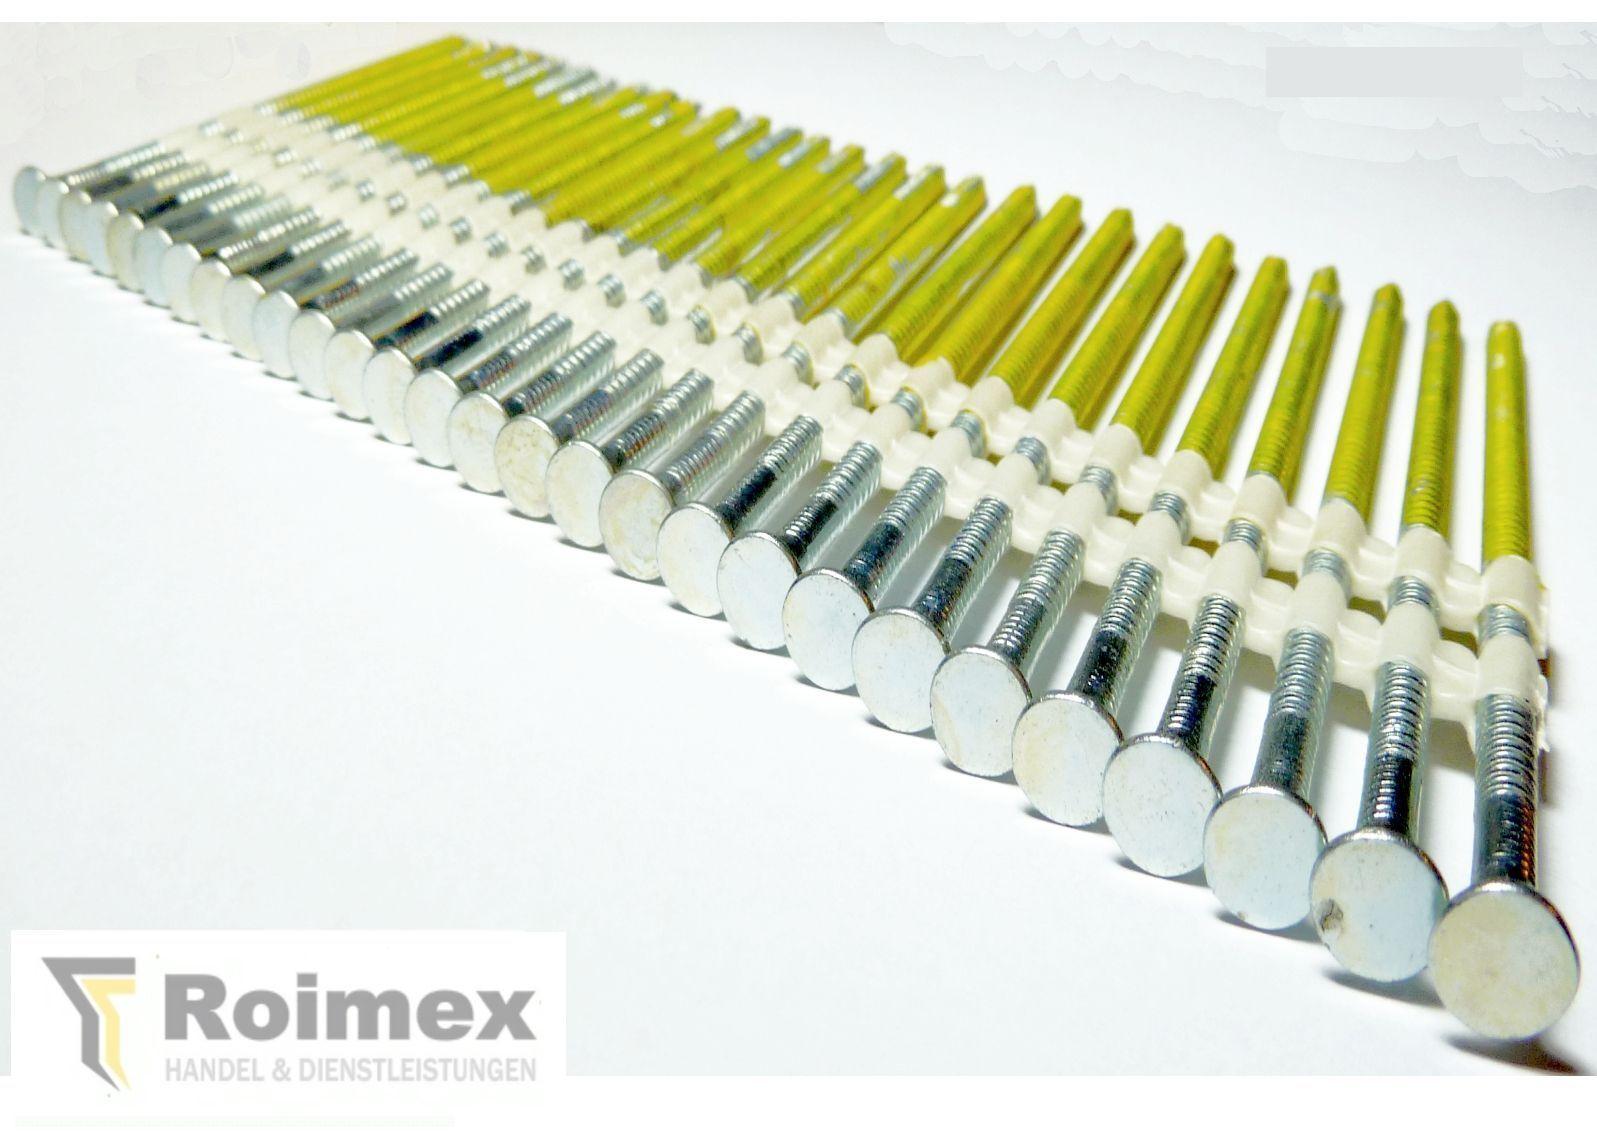 1500 Streifennägel 20-22° 4,2x130mm Kunststoffgeb.blank glatt zertifiziert